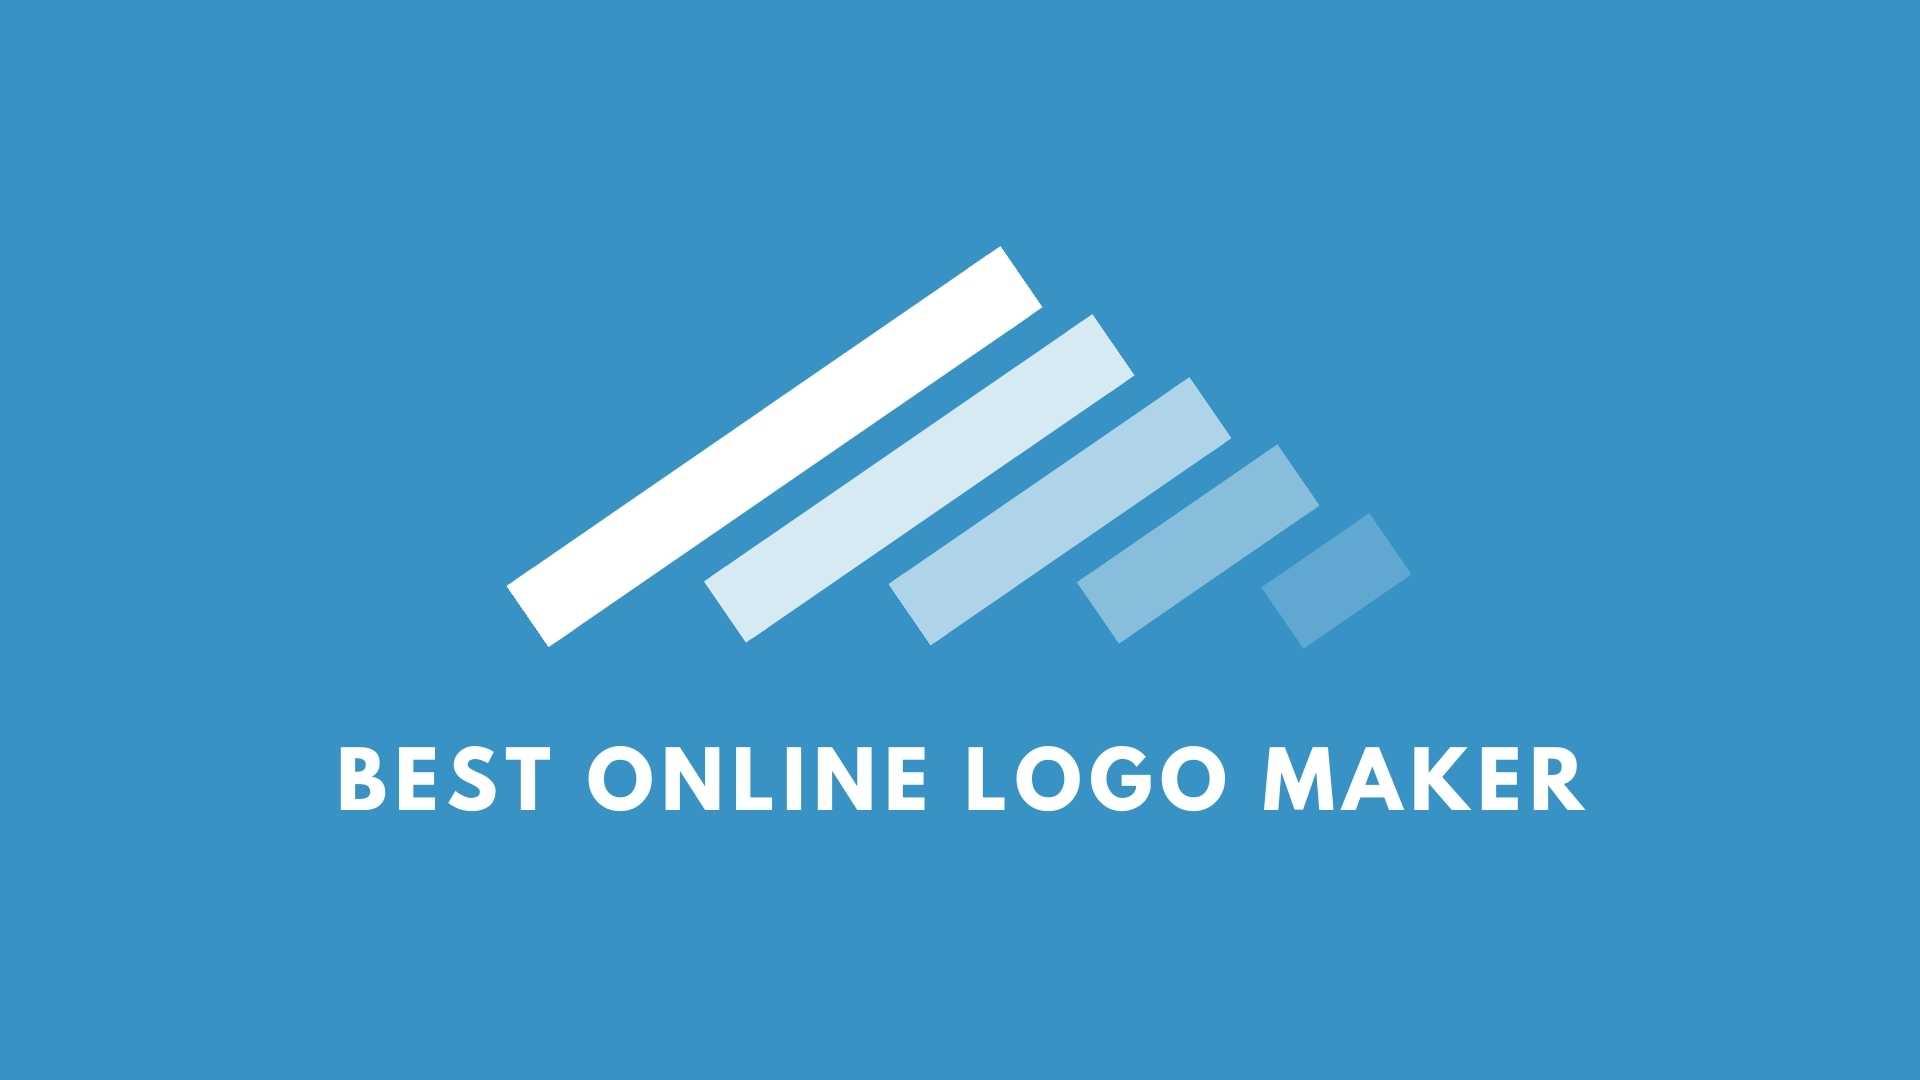 Best Online Logo Maker